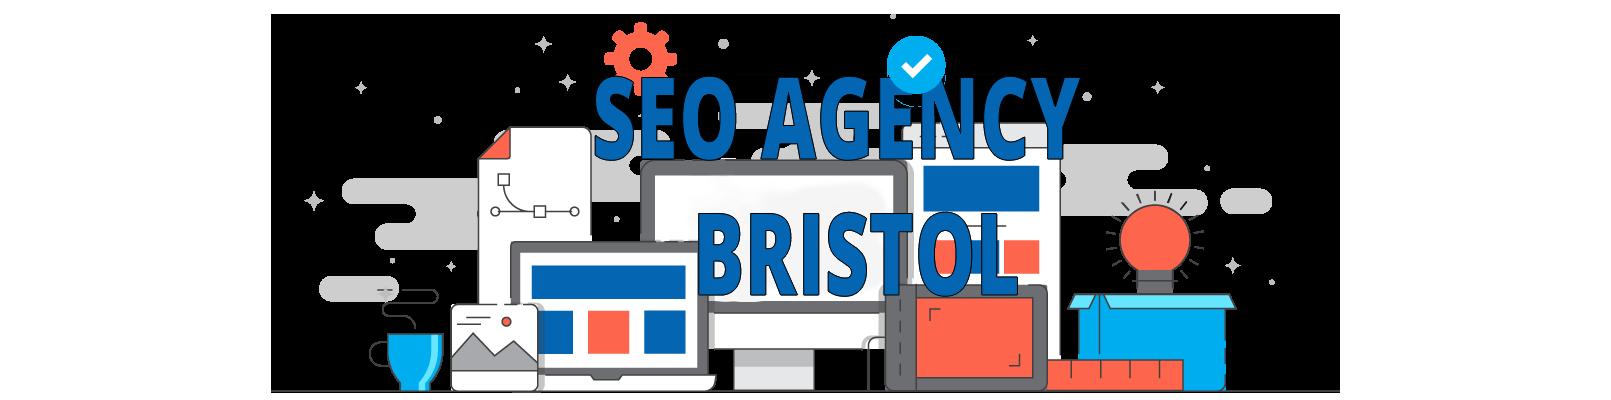 SEO-agency-Bristol